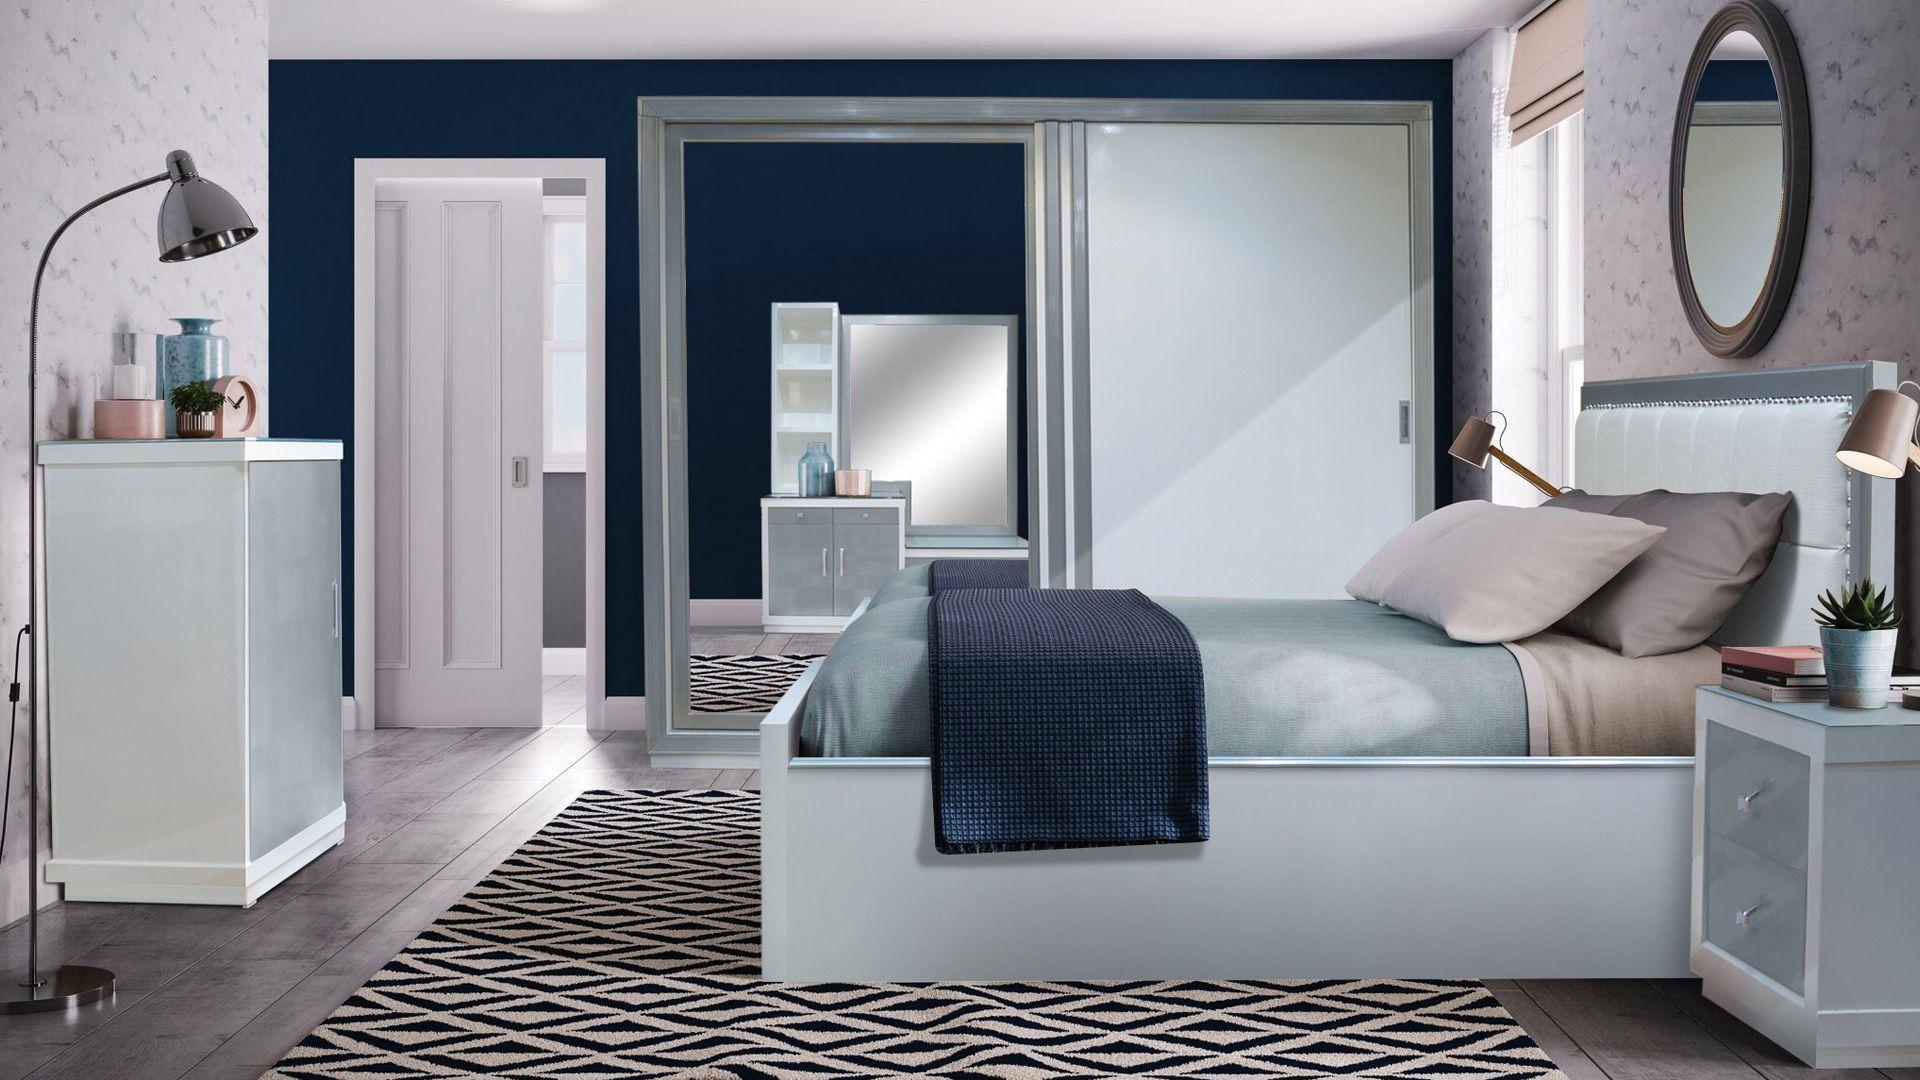 غرفة نوم مودرن White Bedroom Color Schemes Drawing Room Furniture Bedroom Colors